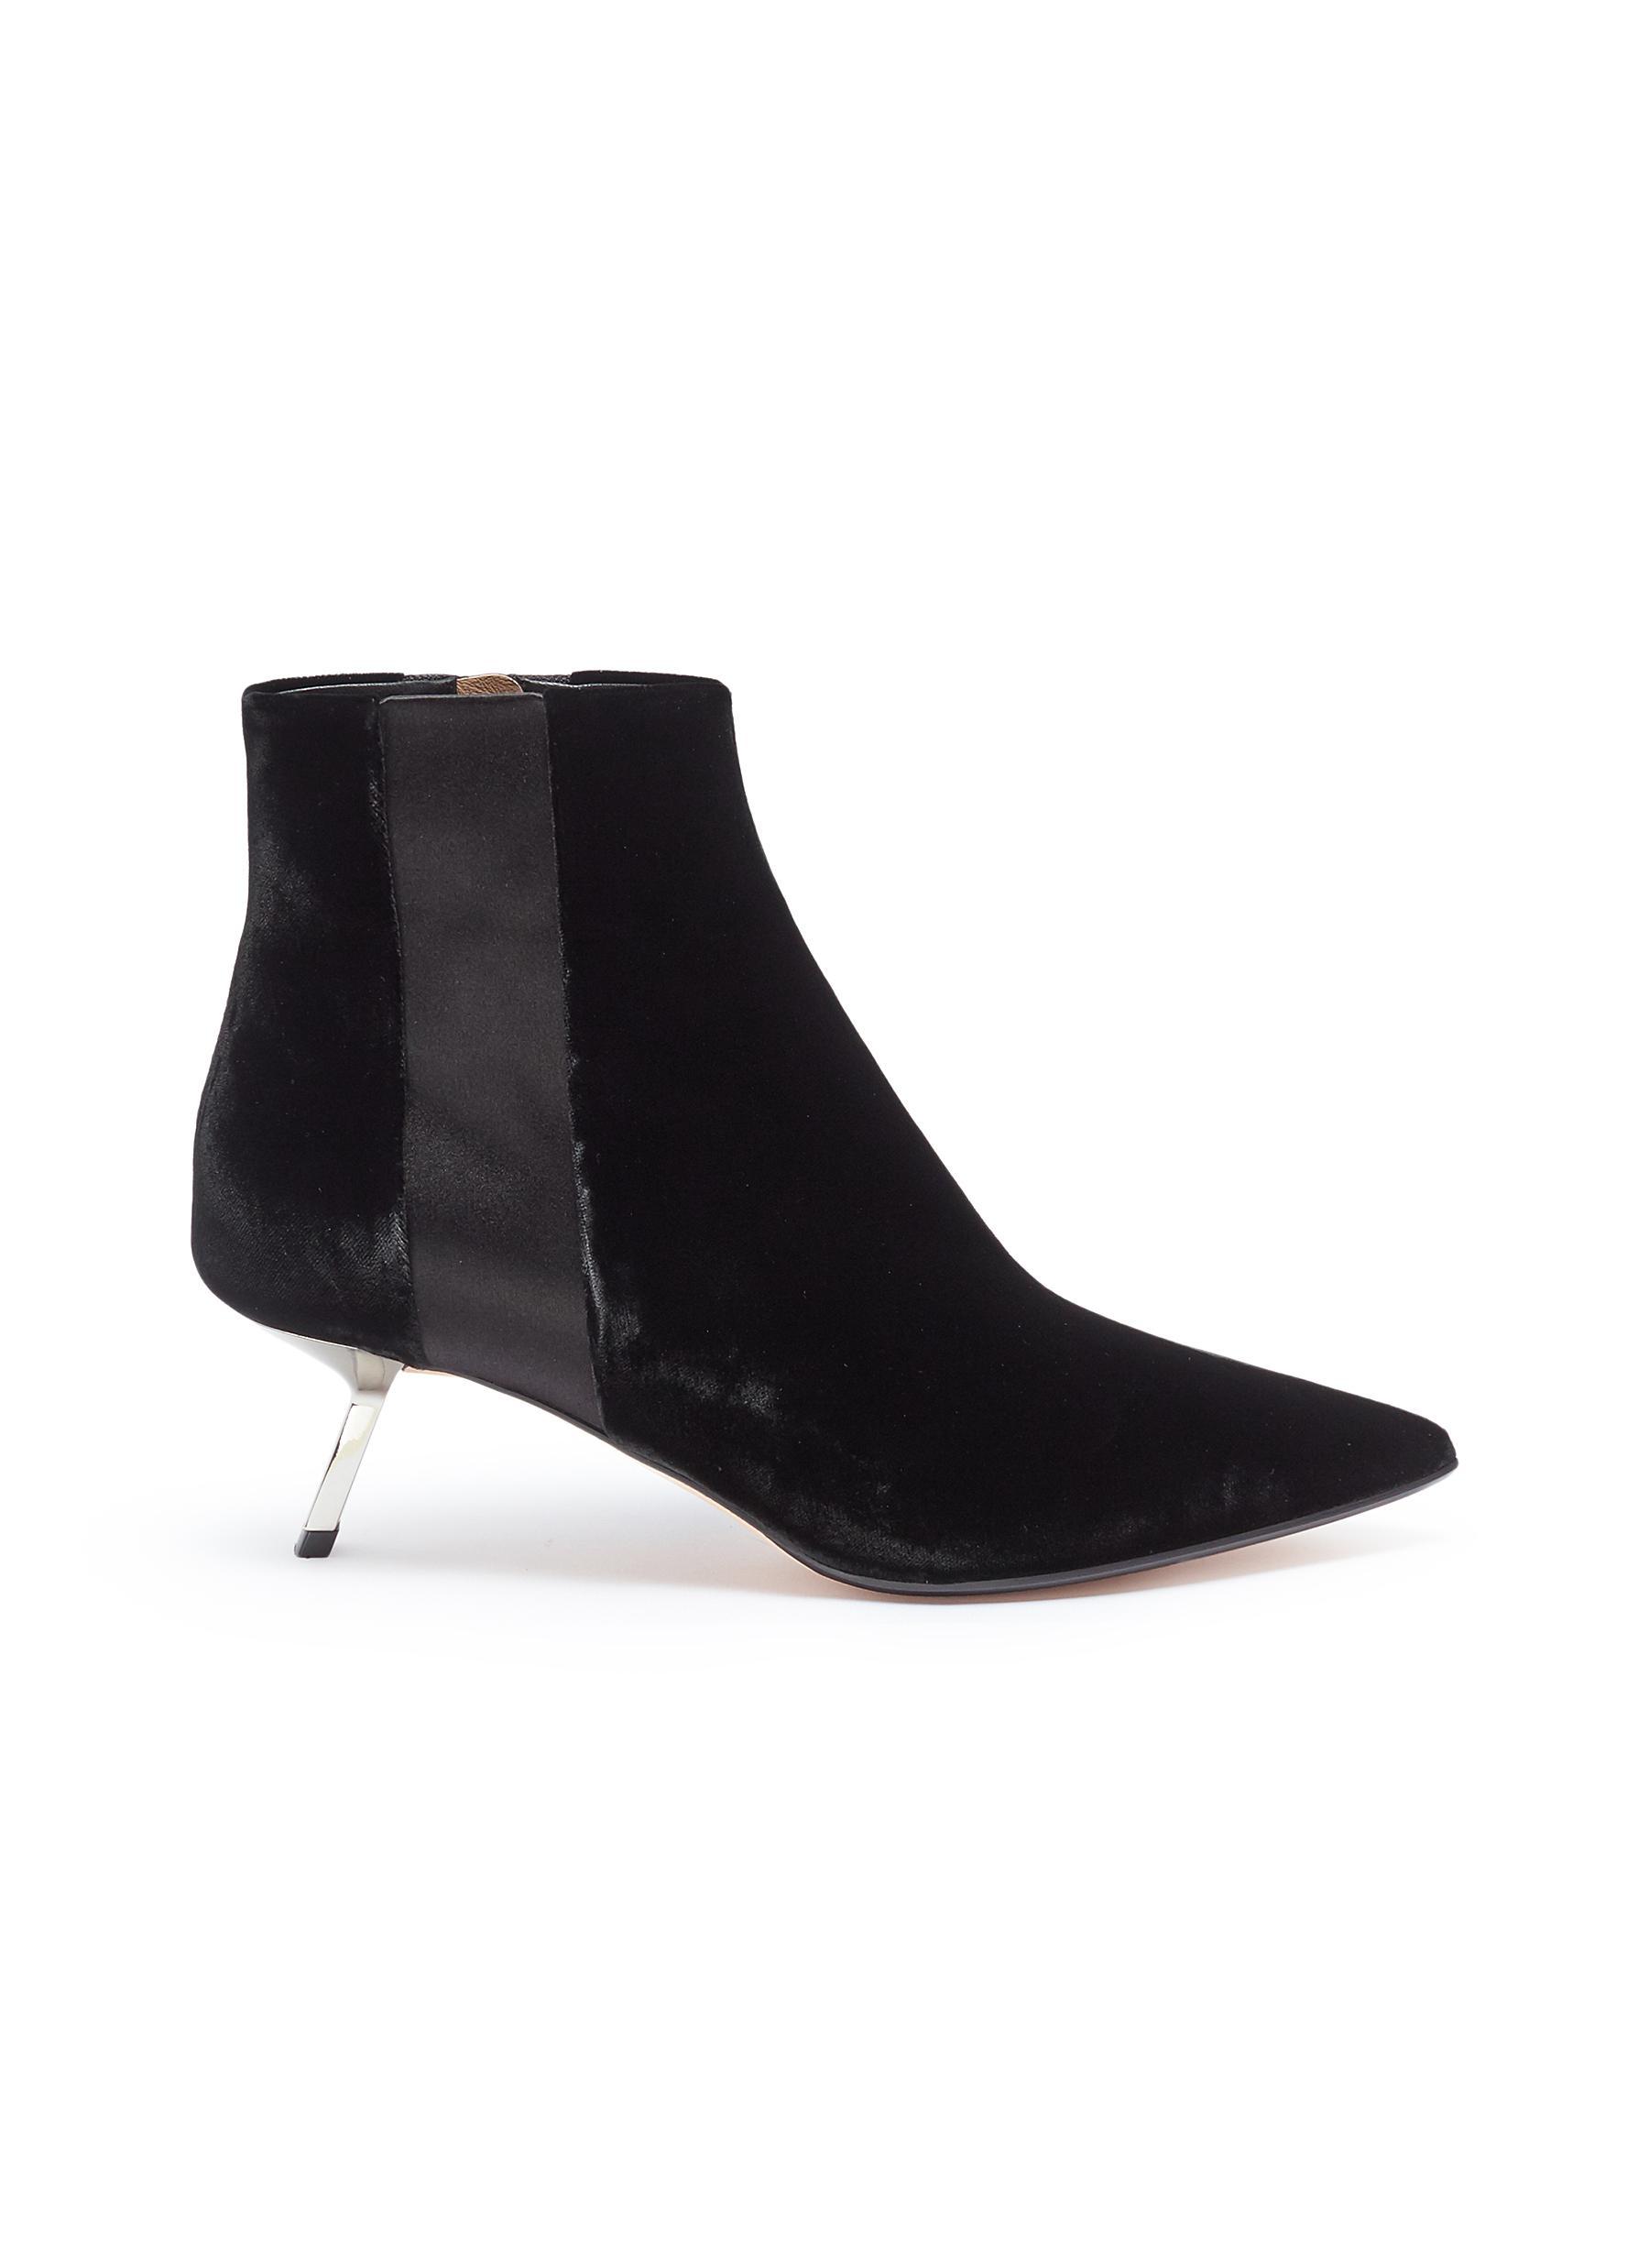 Libra slanted heel satin stripe velvet ankle boots by Alchimia di Ballin